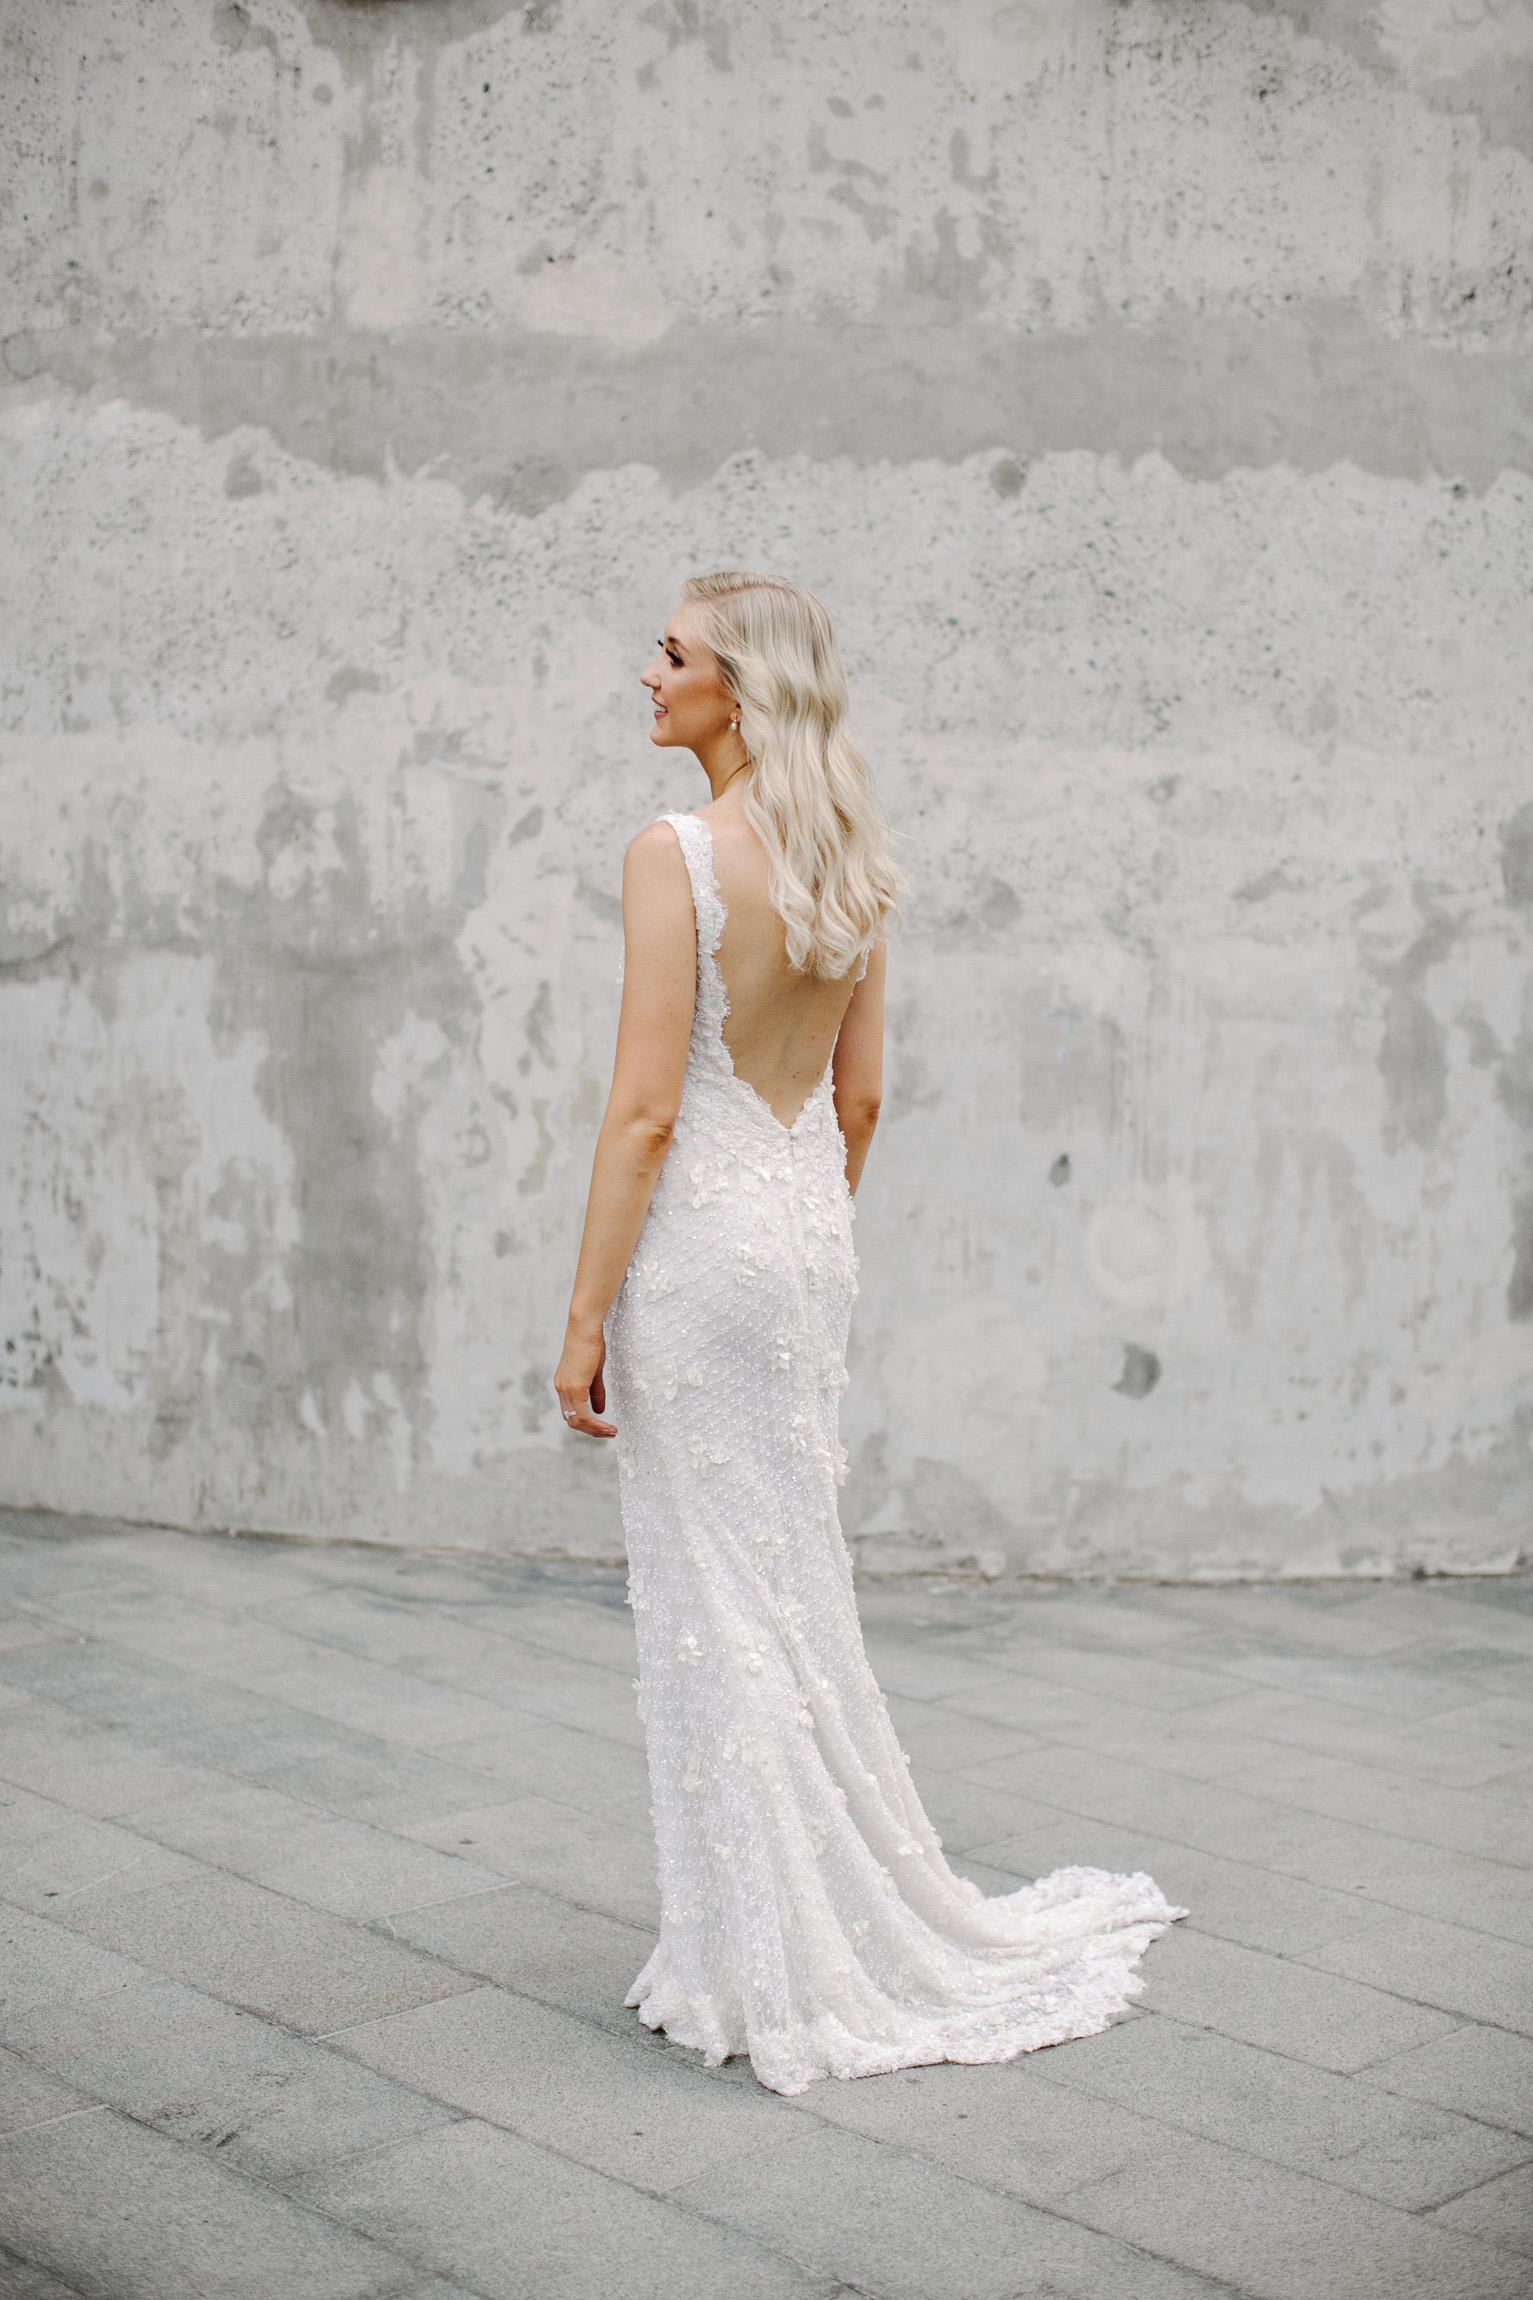 180223_justinaaron_wedding_charlotte_david_h-207.jpg